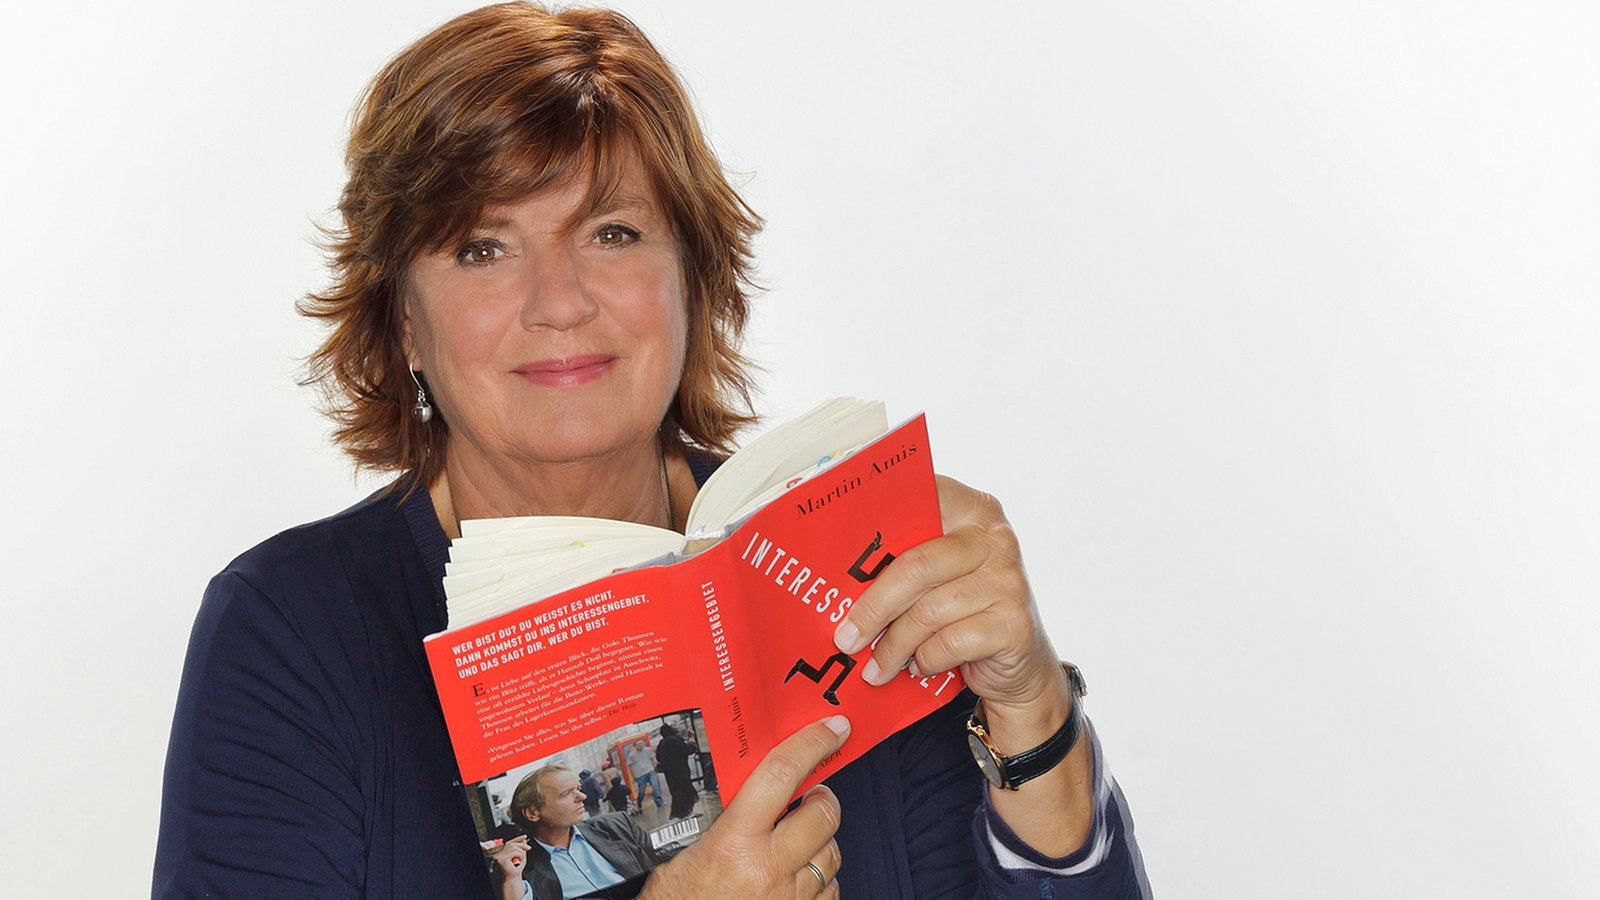 Wdr Buchtipp Christine Westermann